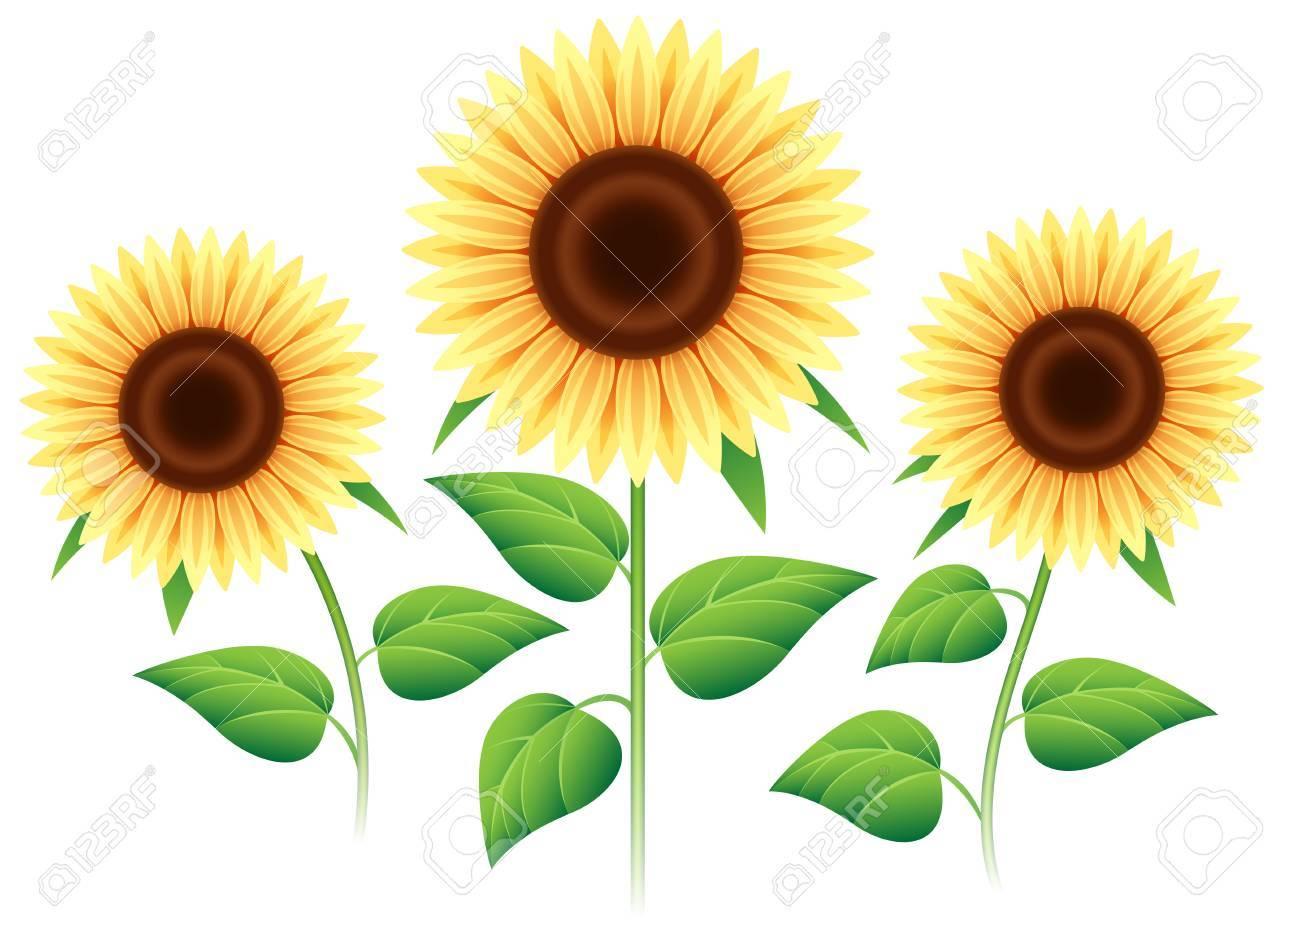 Sunflower Set Isolated On White Background Vector Cartoon Sunflowers Plants For Summer Invitation Stock